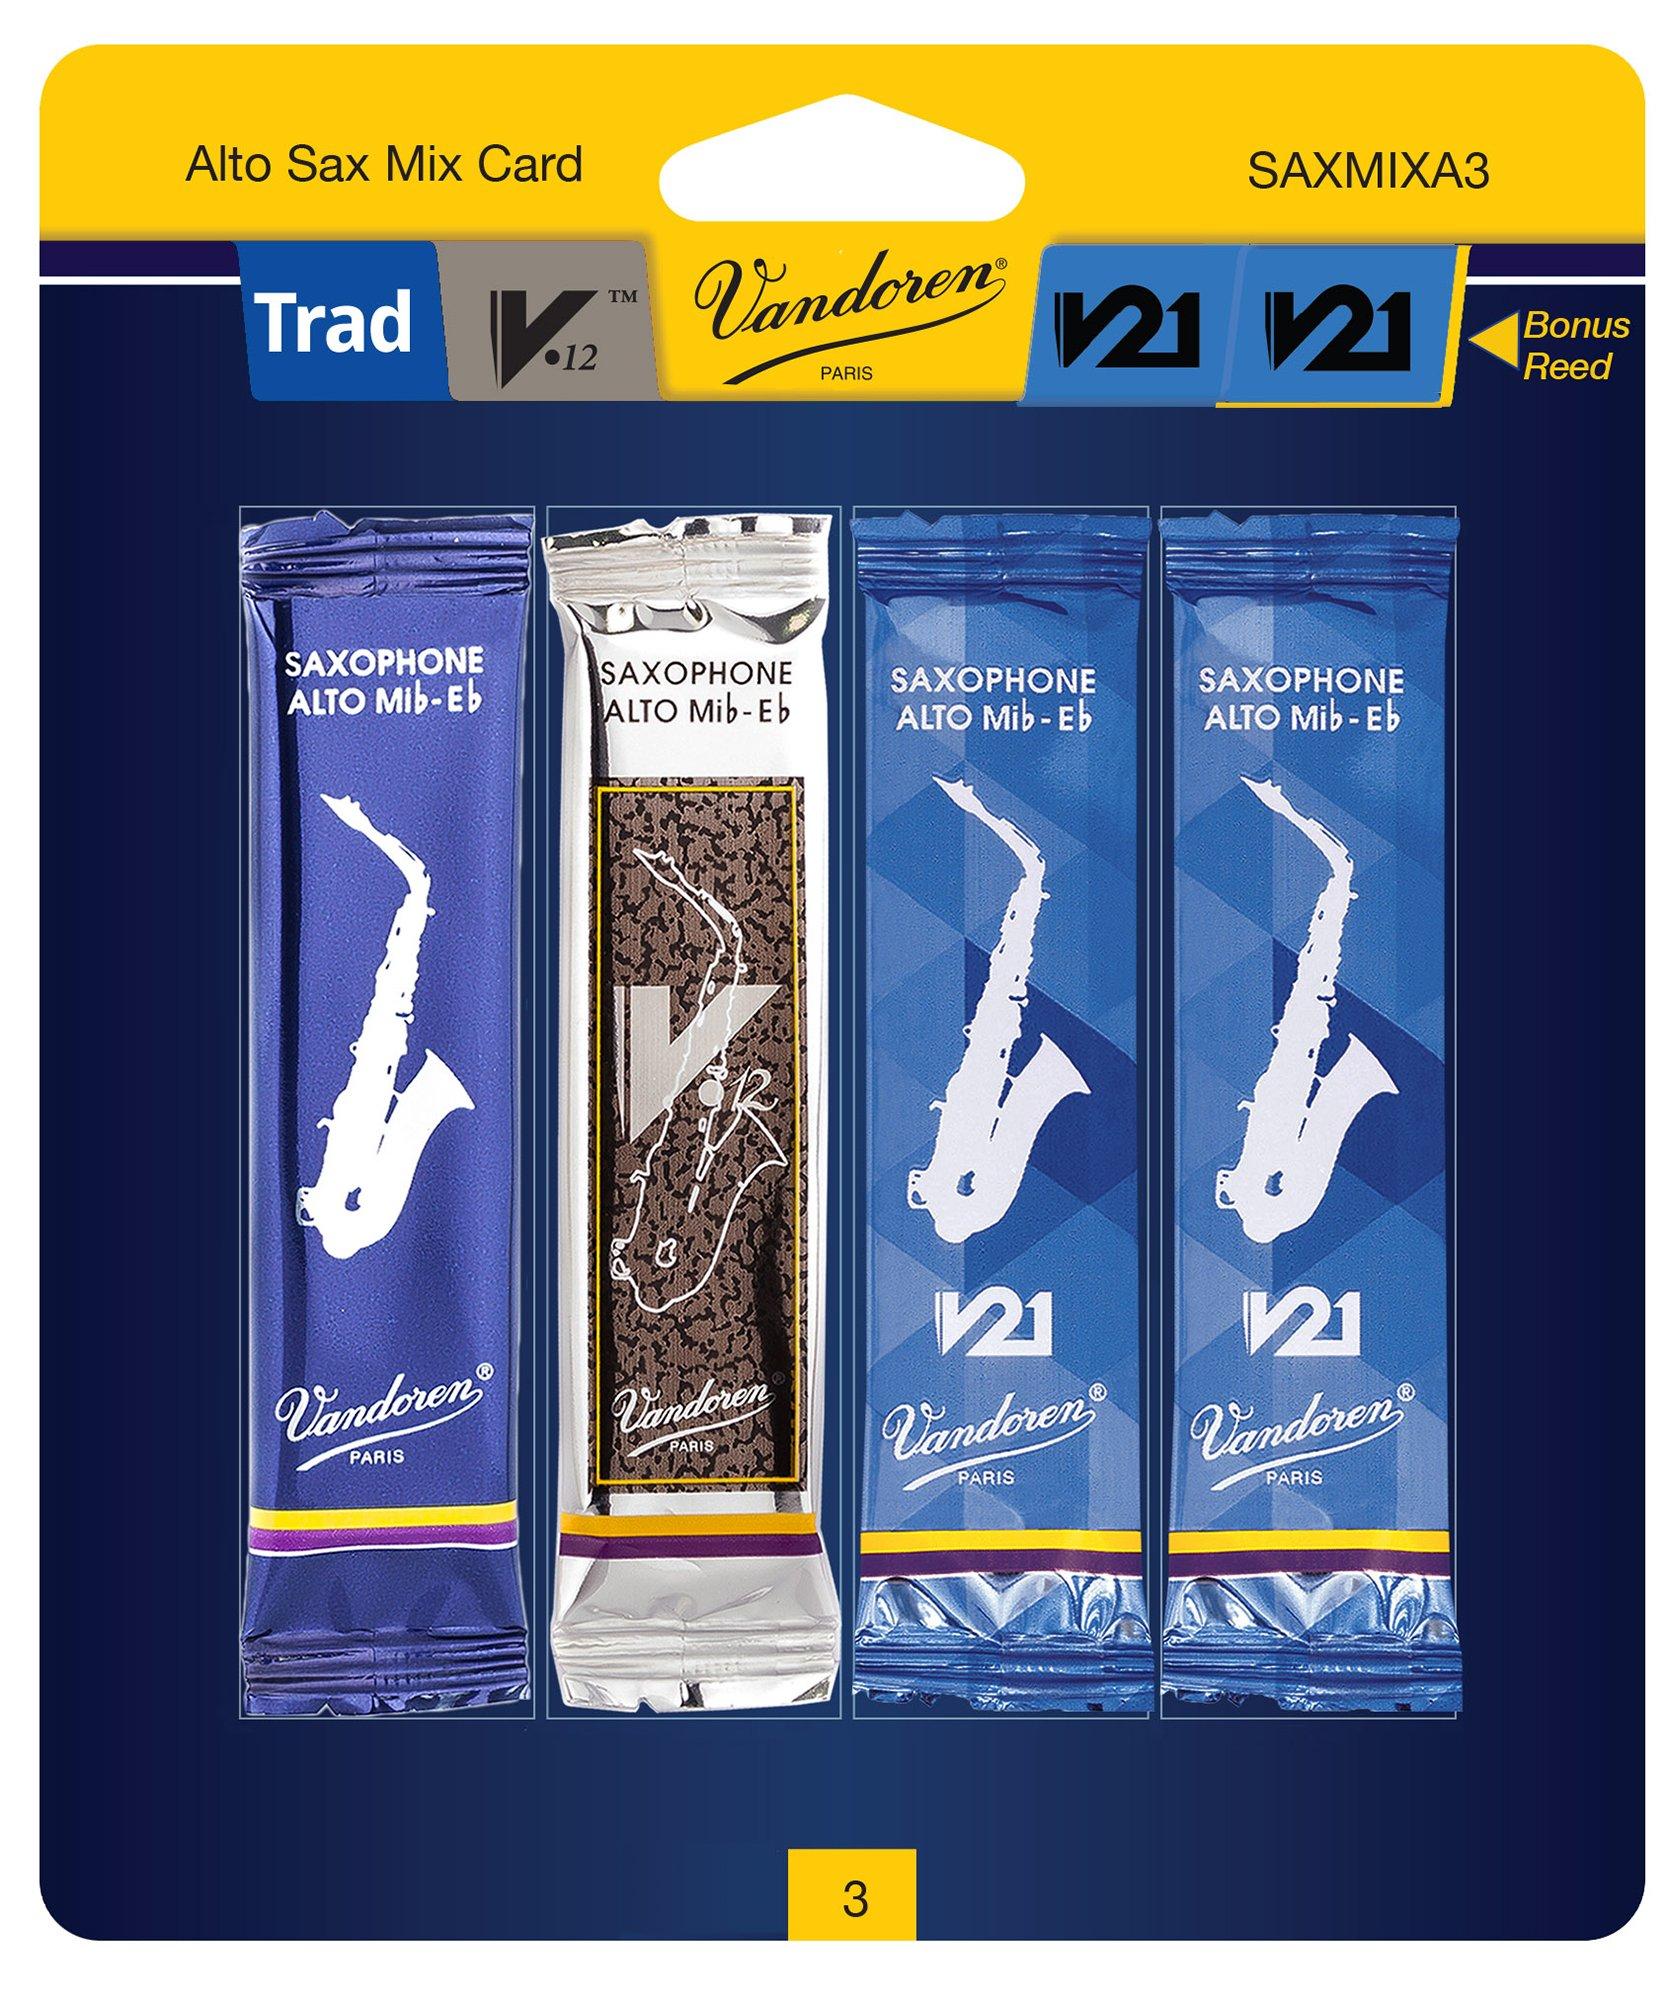 Vandoren SAXMIXA3 Alto Saxophone Mix Card 3